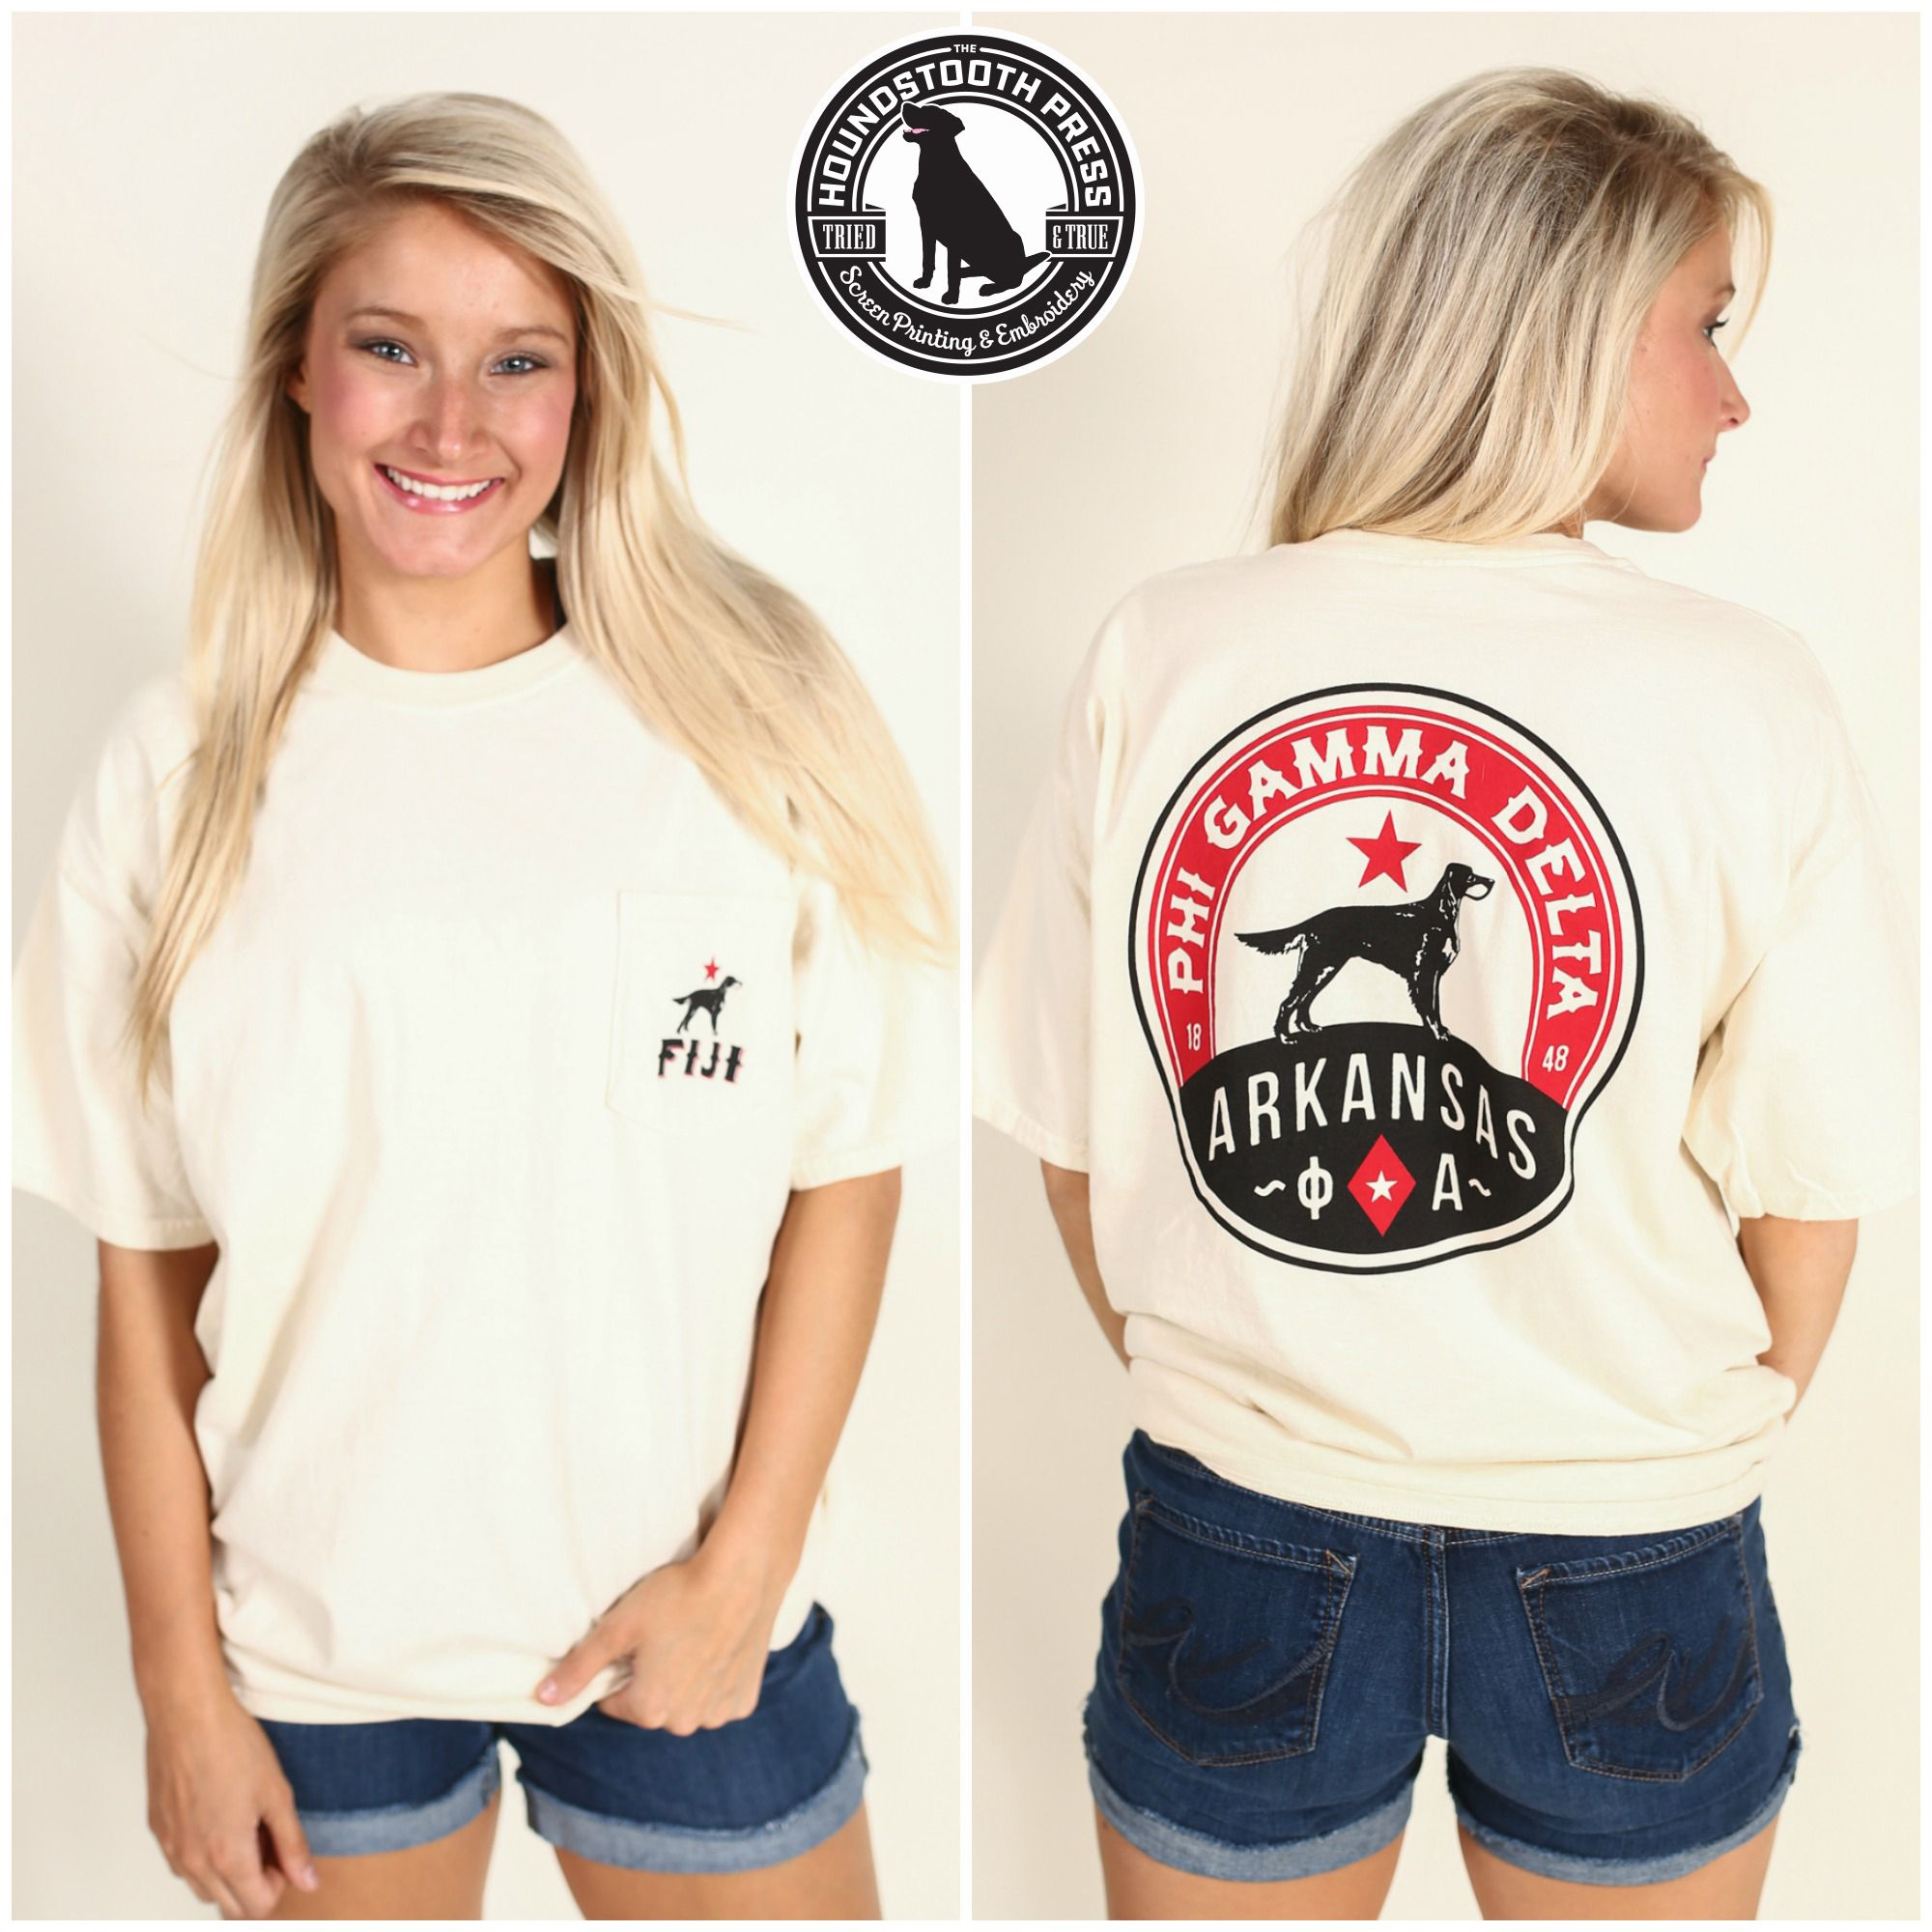 Design t shirt comfort colors - University Of Arkansas Fiji Promotional T Shirt Comfort Colors Ivory Love The